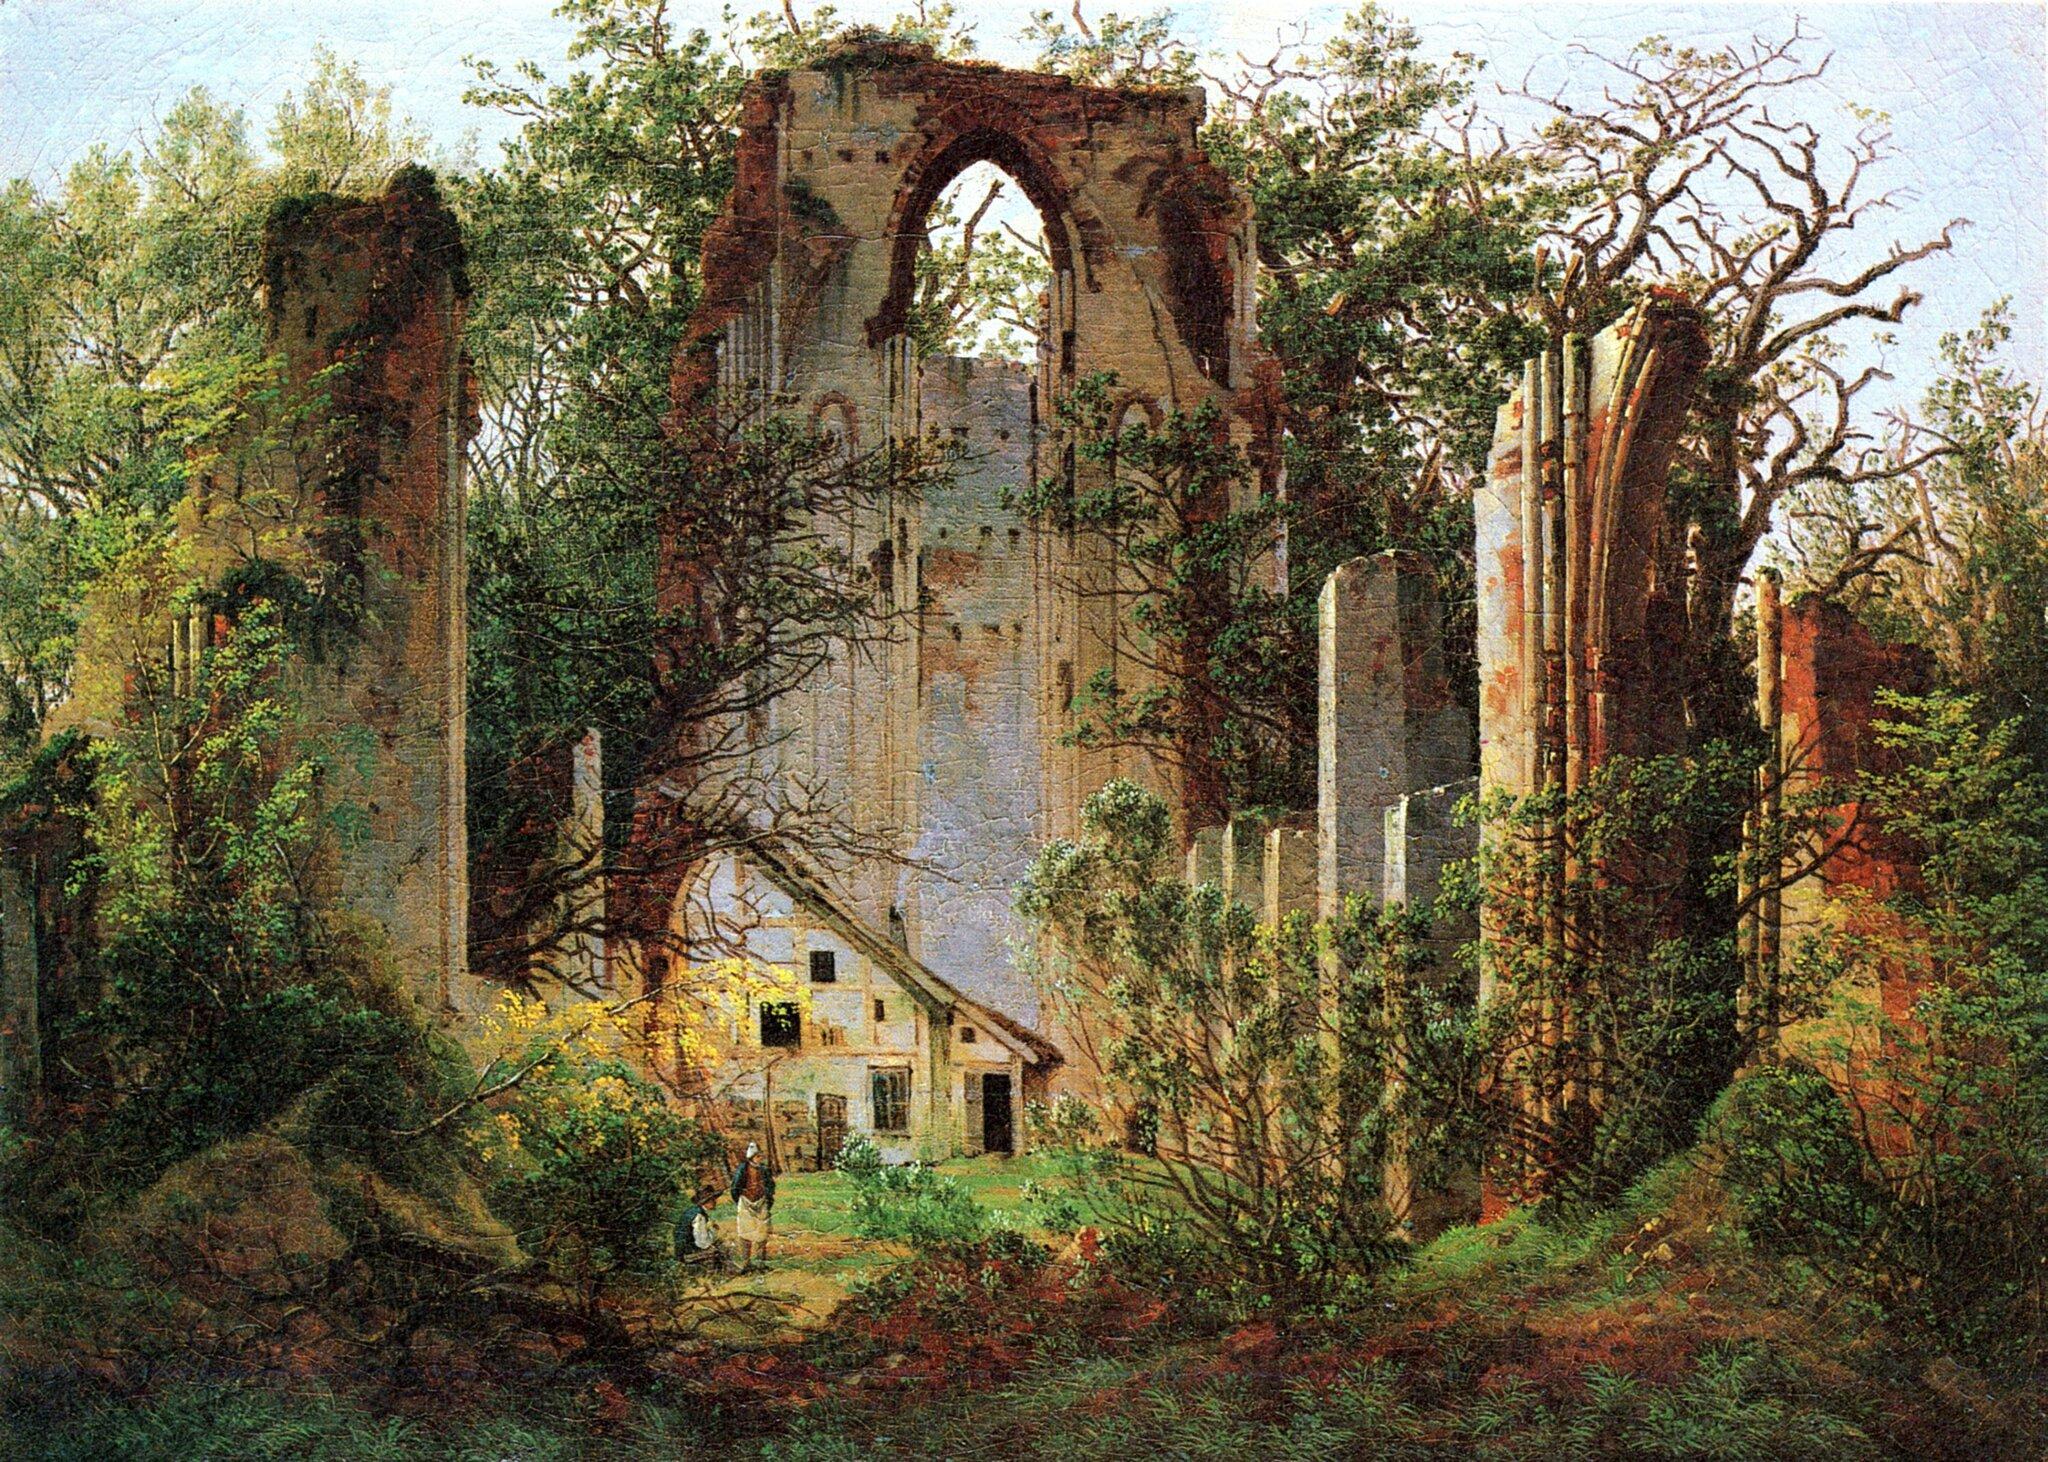 Ruiny klasztoru Eldena 1. Źródło: Caspar David Friedrich, Ruiny klasztoru Eldena, ok. 1825, olej na płótnie, Alte Nationalgalerie, Berlin, domena publiczna.